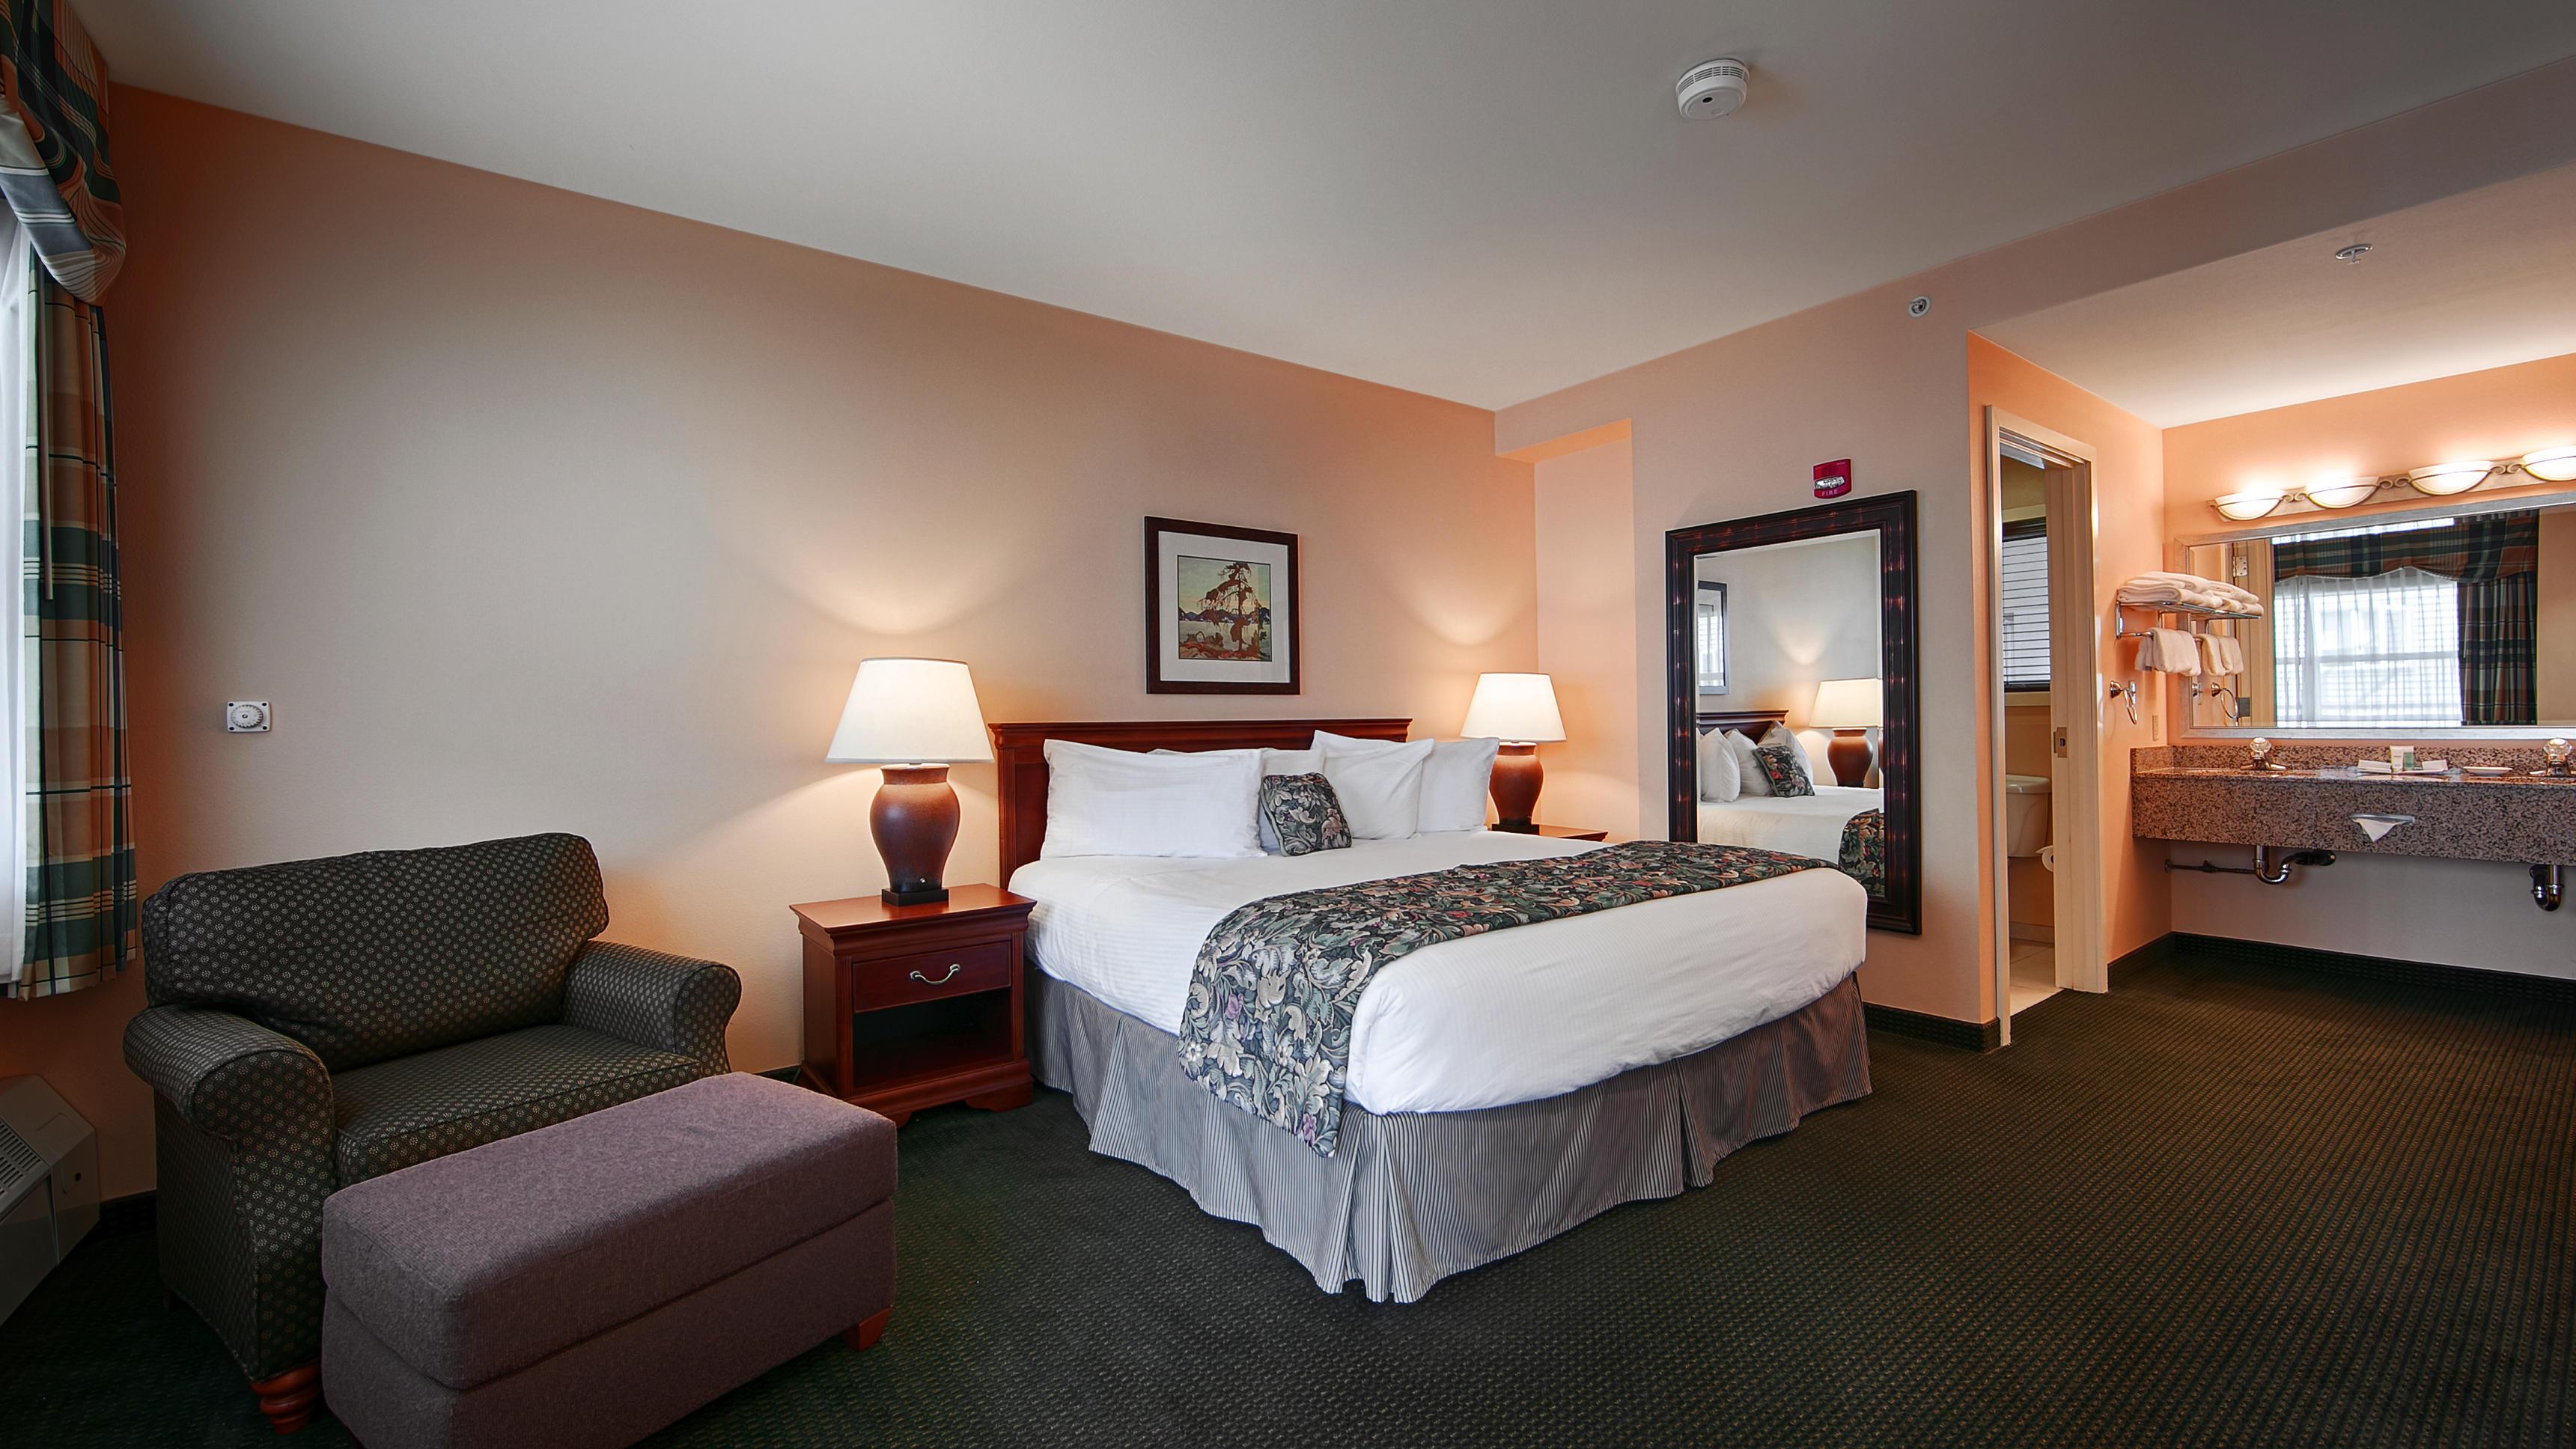 The Landing Hotel image 1